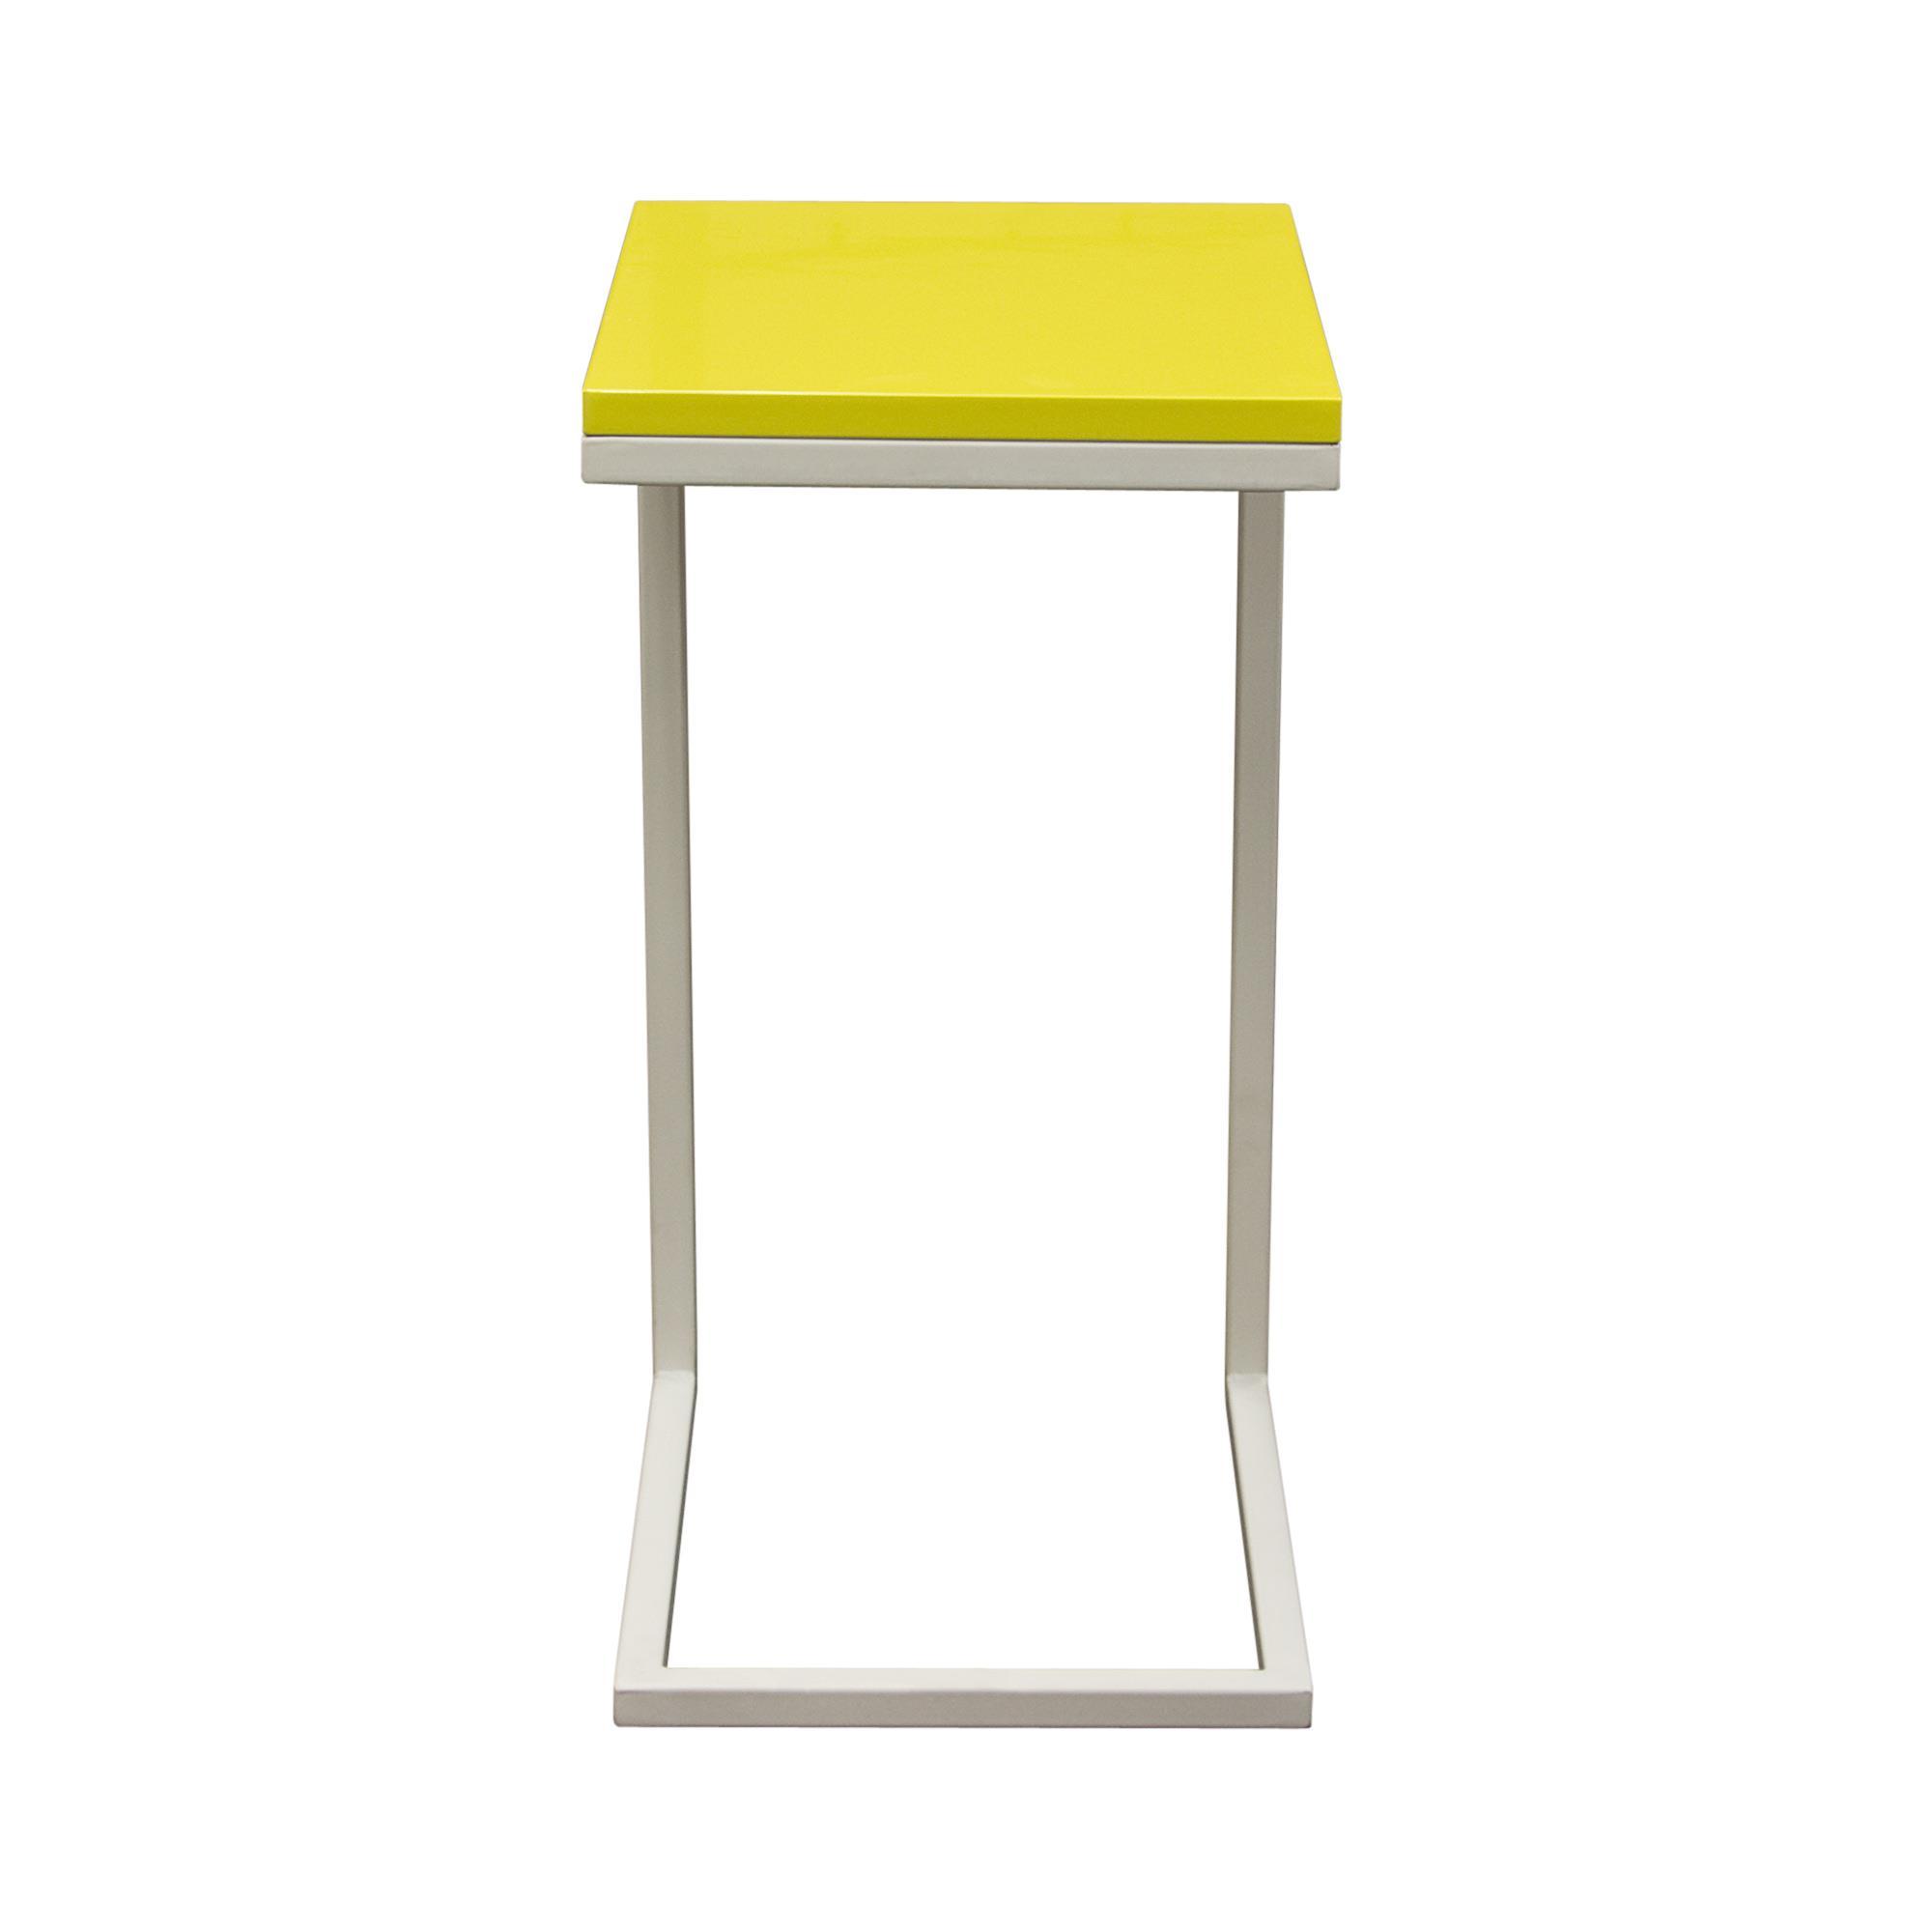 Diamond Sofa Occasional Tables & Entertainment Sleek Metal Frame Accent Table - Item Number: EDGESTYL